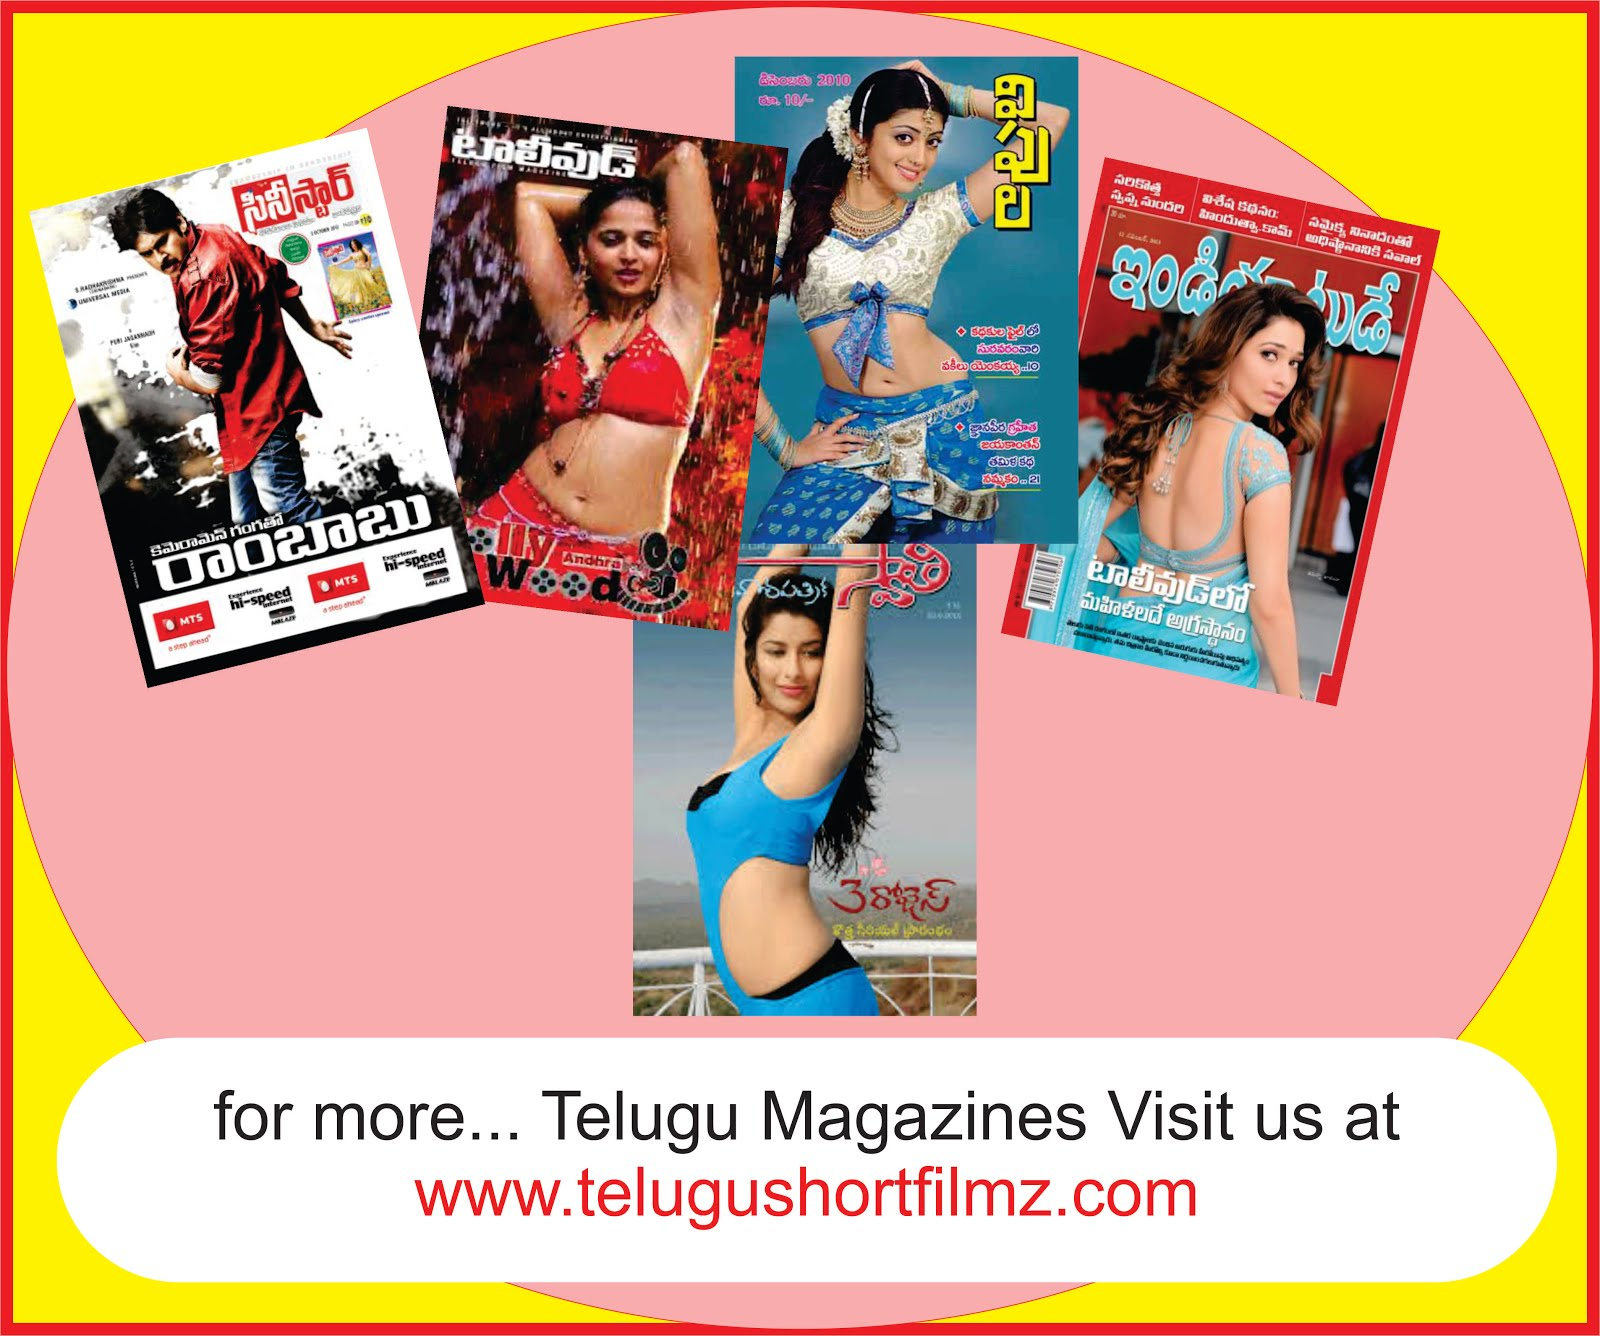 Telugushortfilmz.com